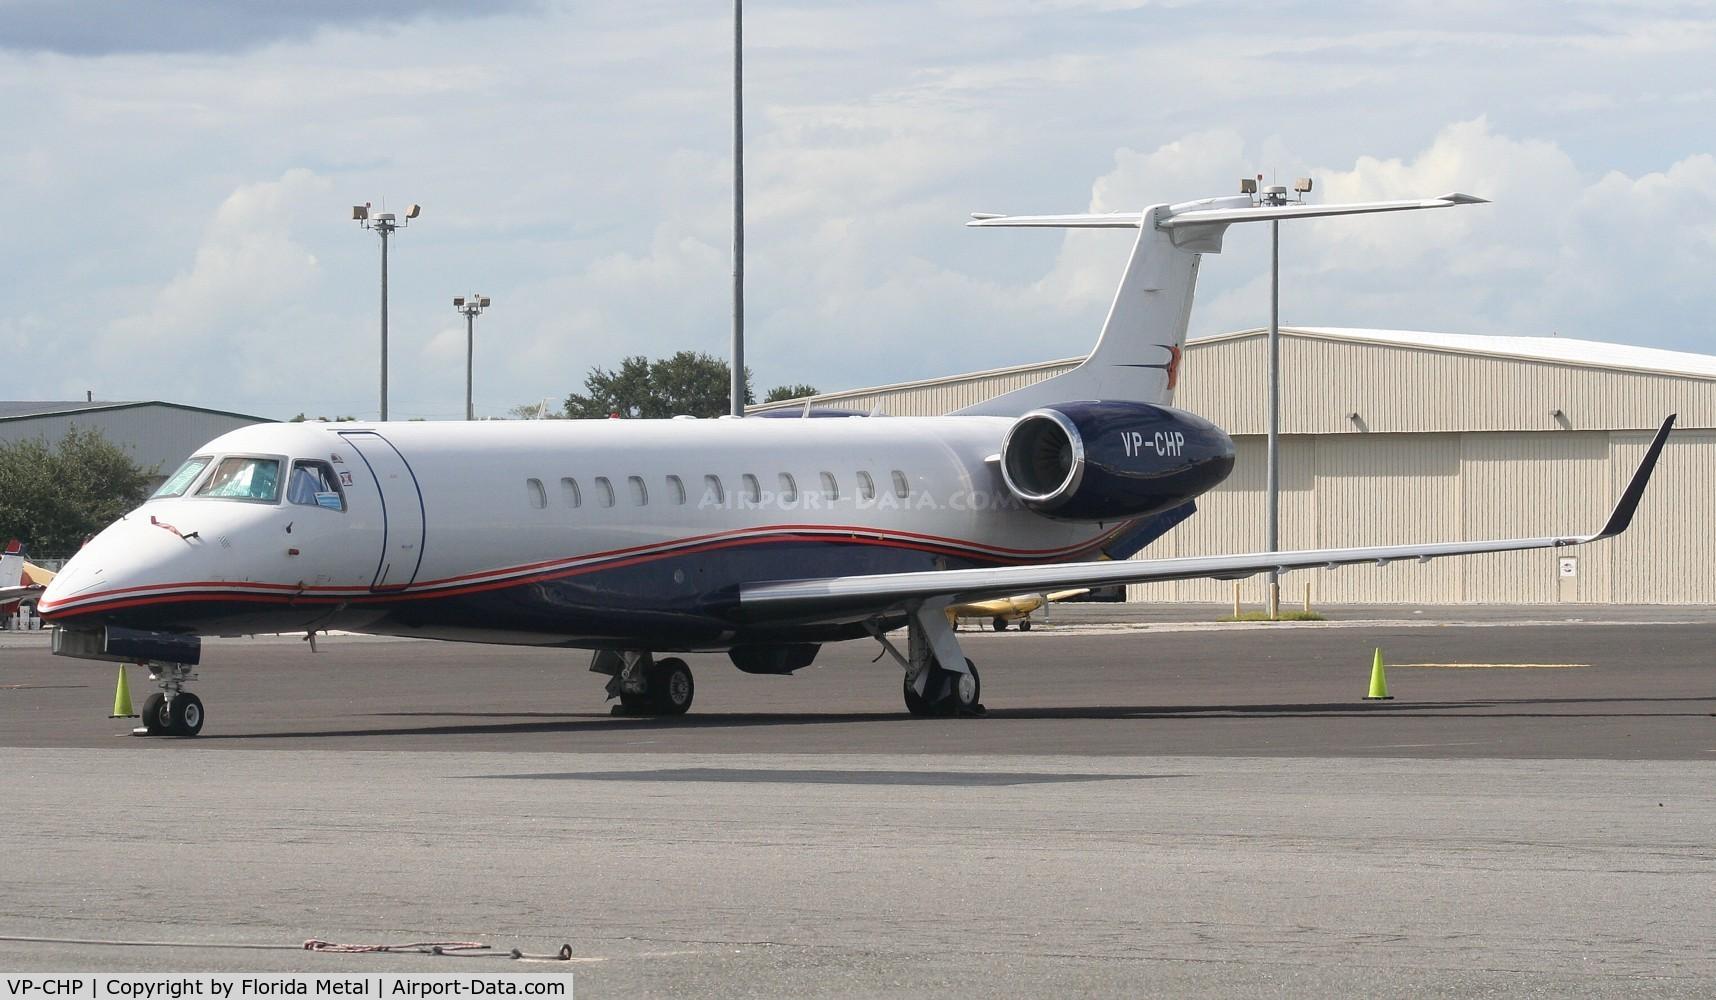 VP-CHP, 2004 Embraer EMB-135BJ Legacy C/N 14500802, Embraer Legacy 600